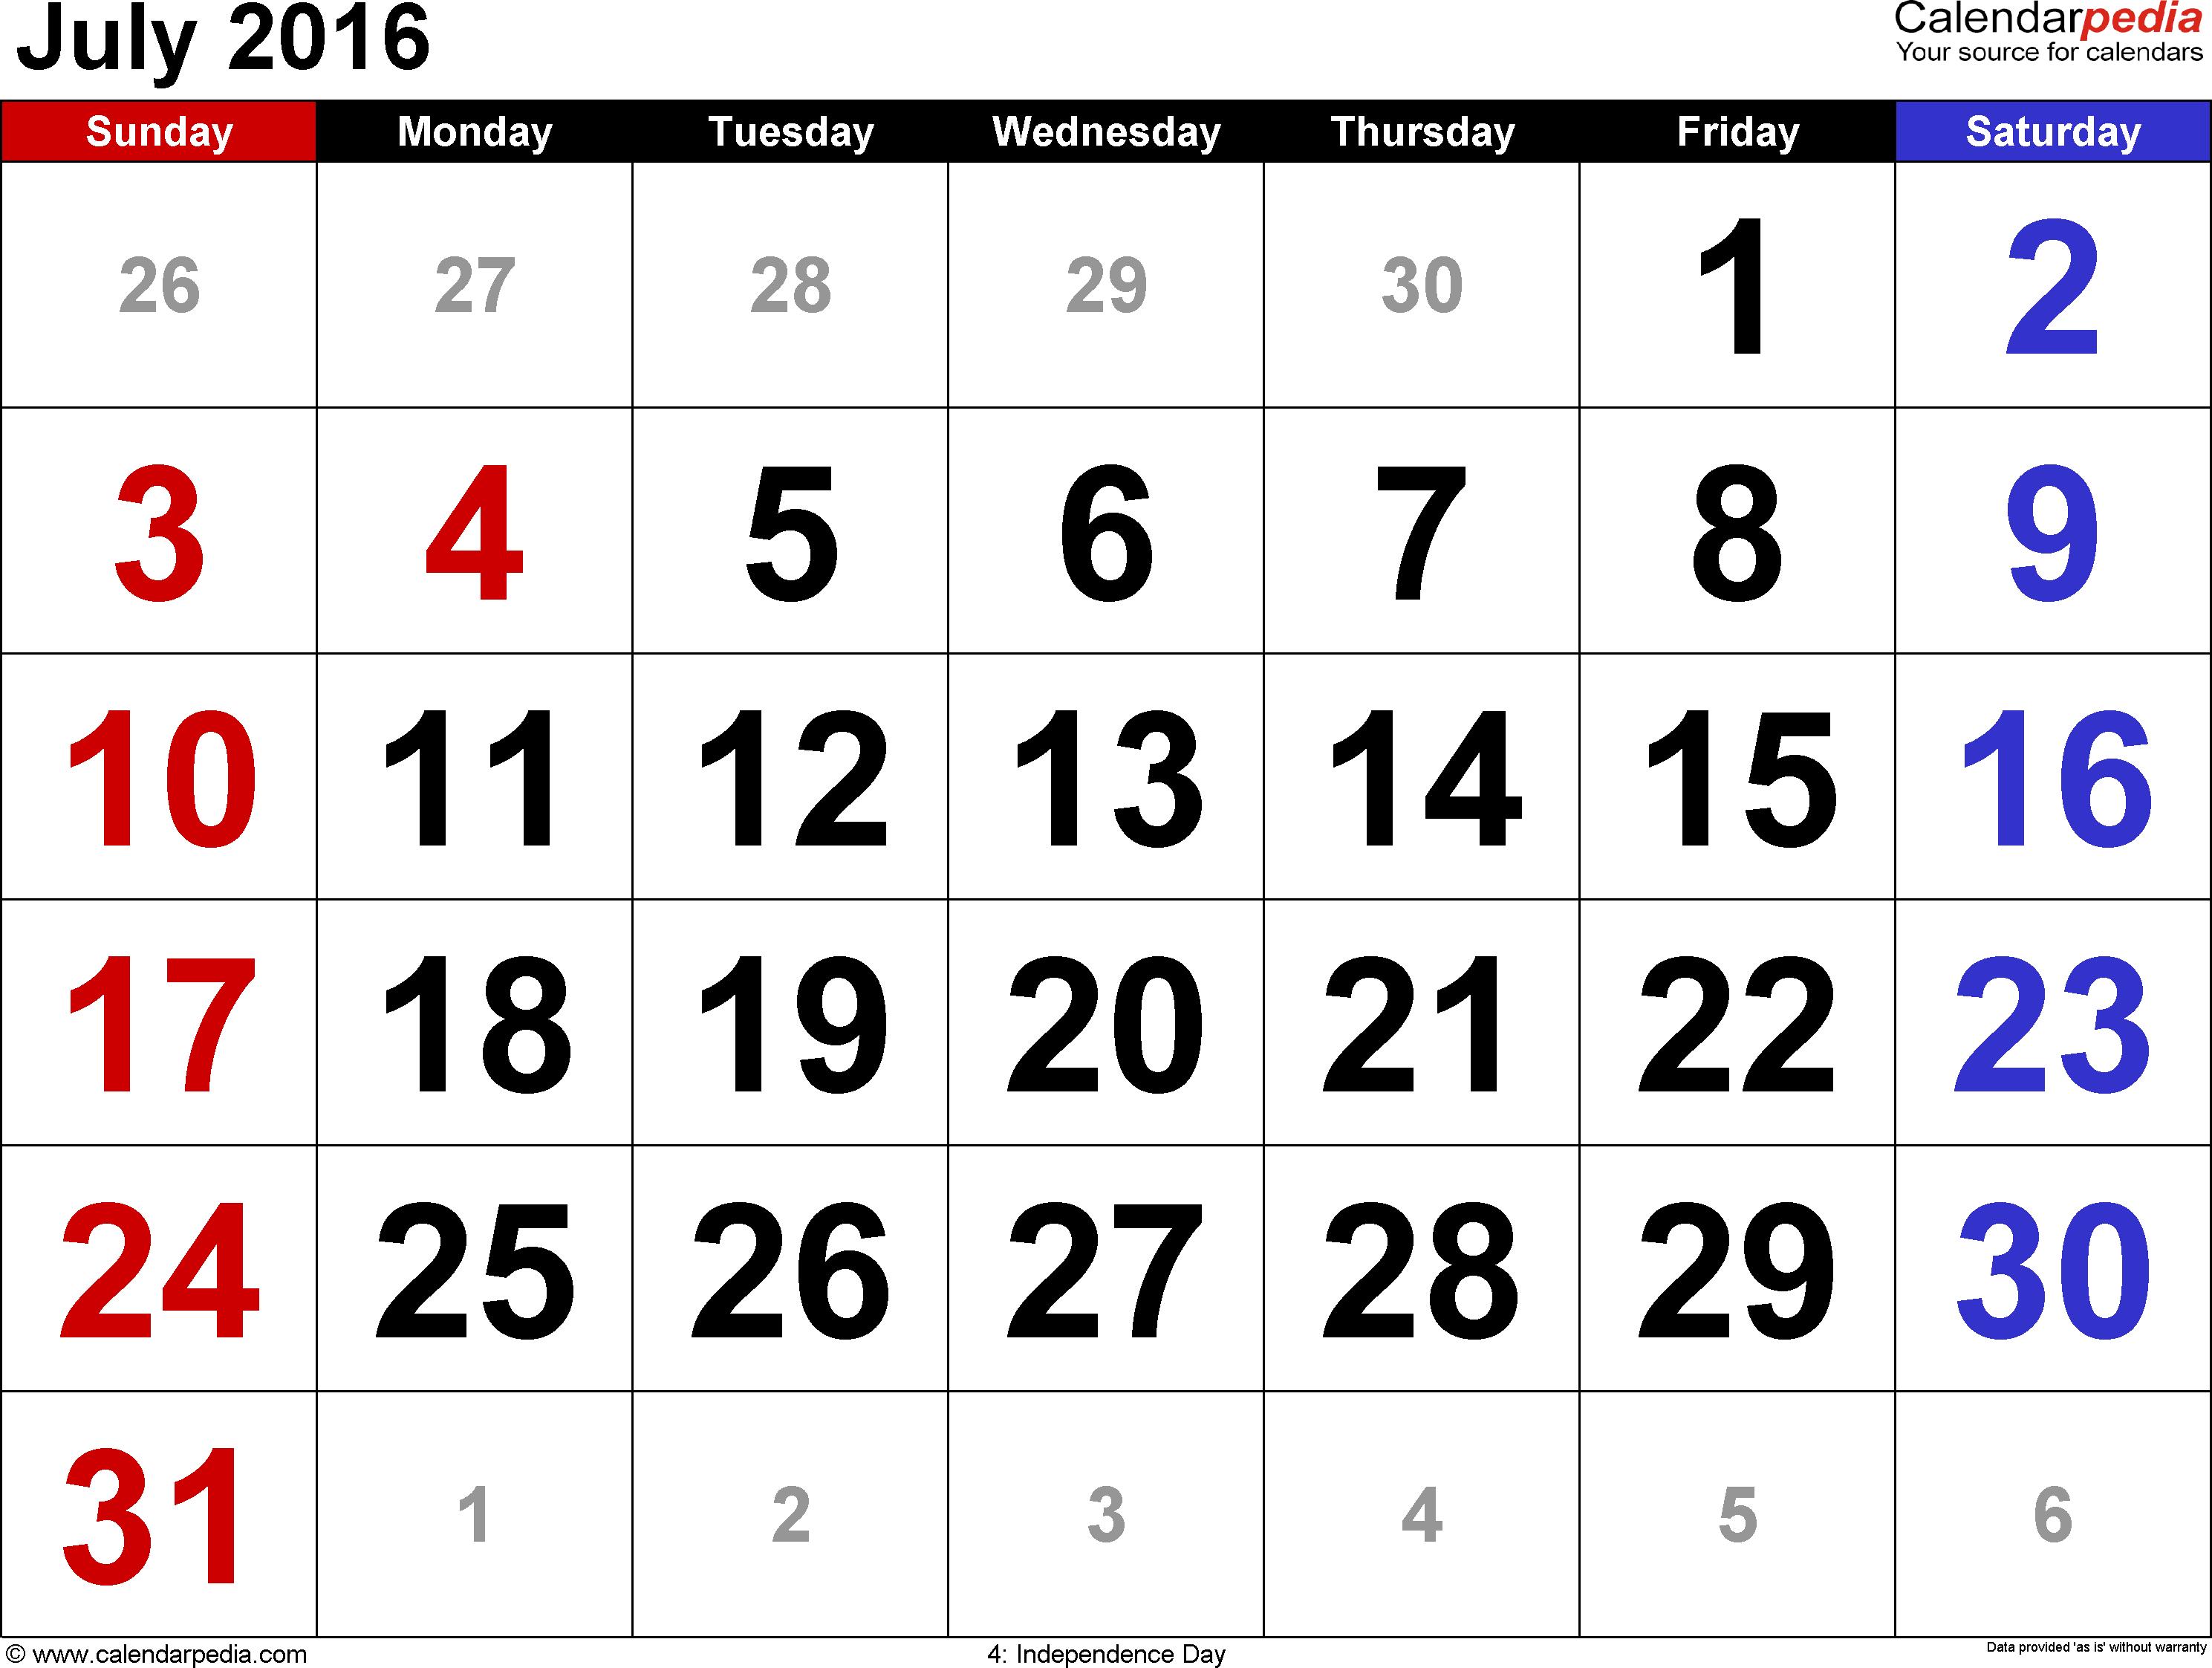 017 Blank Calendar Template July Ideas Wonderful 2016 inside July 2016 Calendar With Holidays